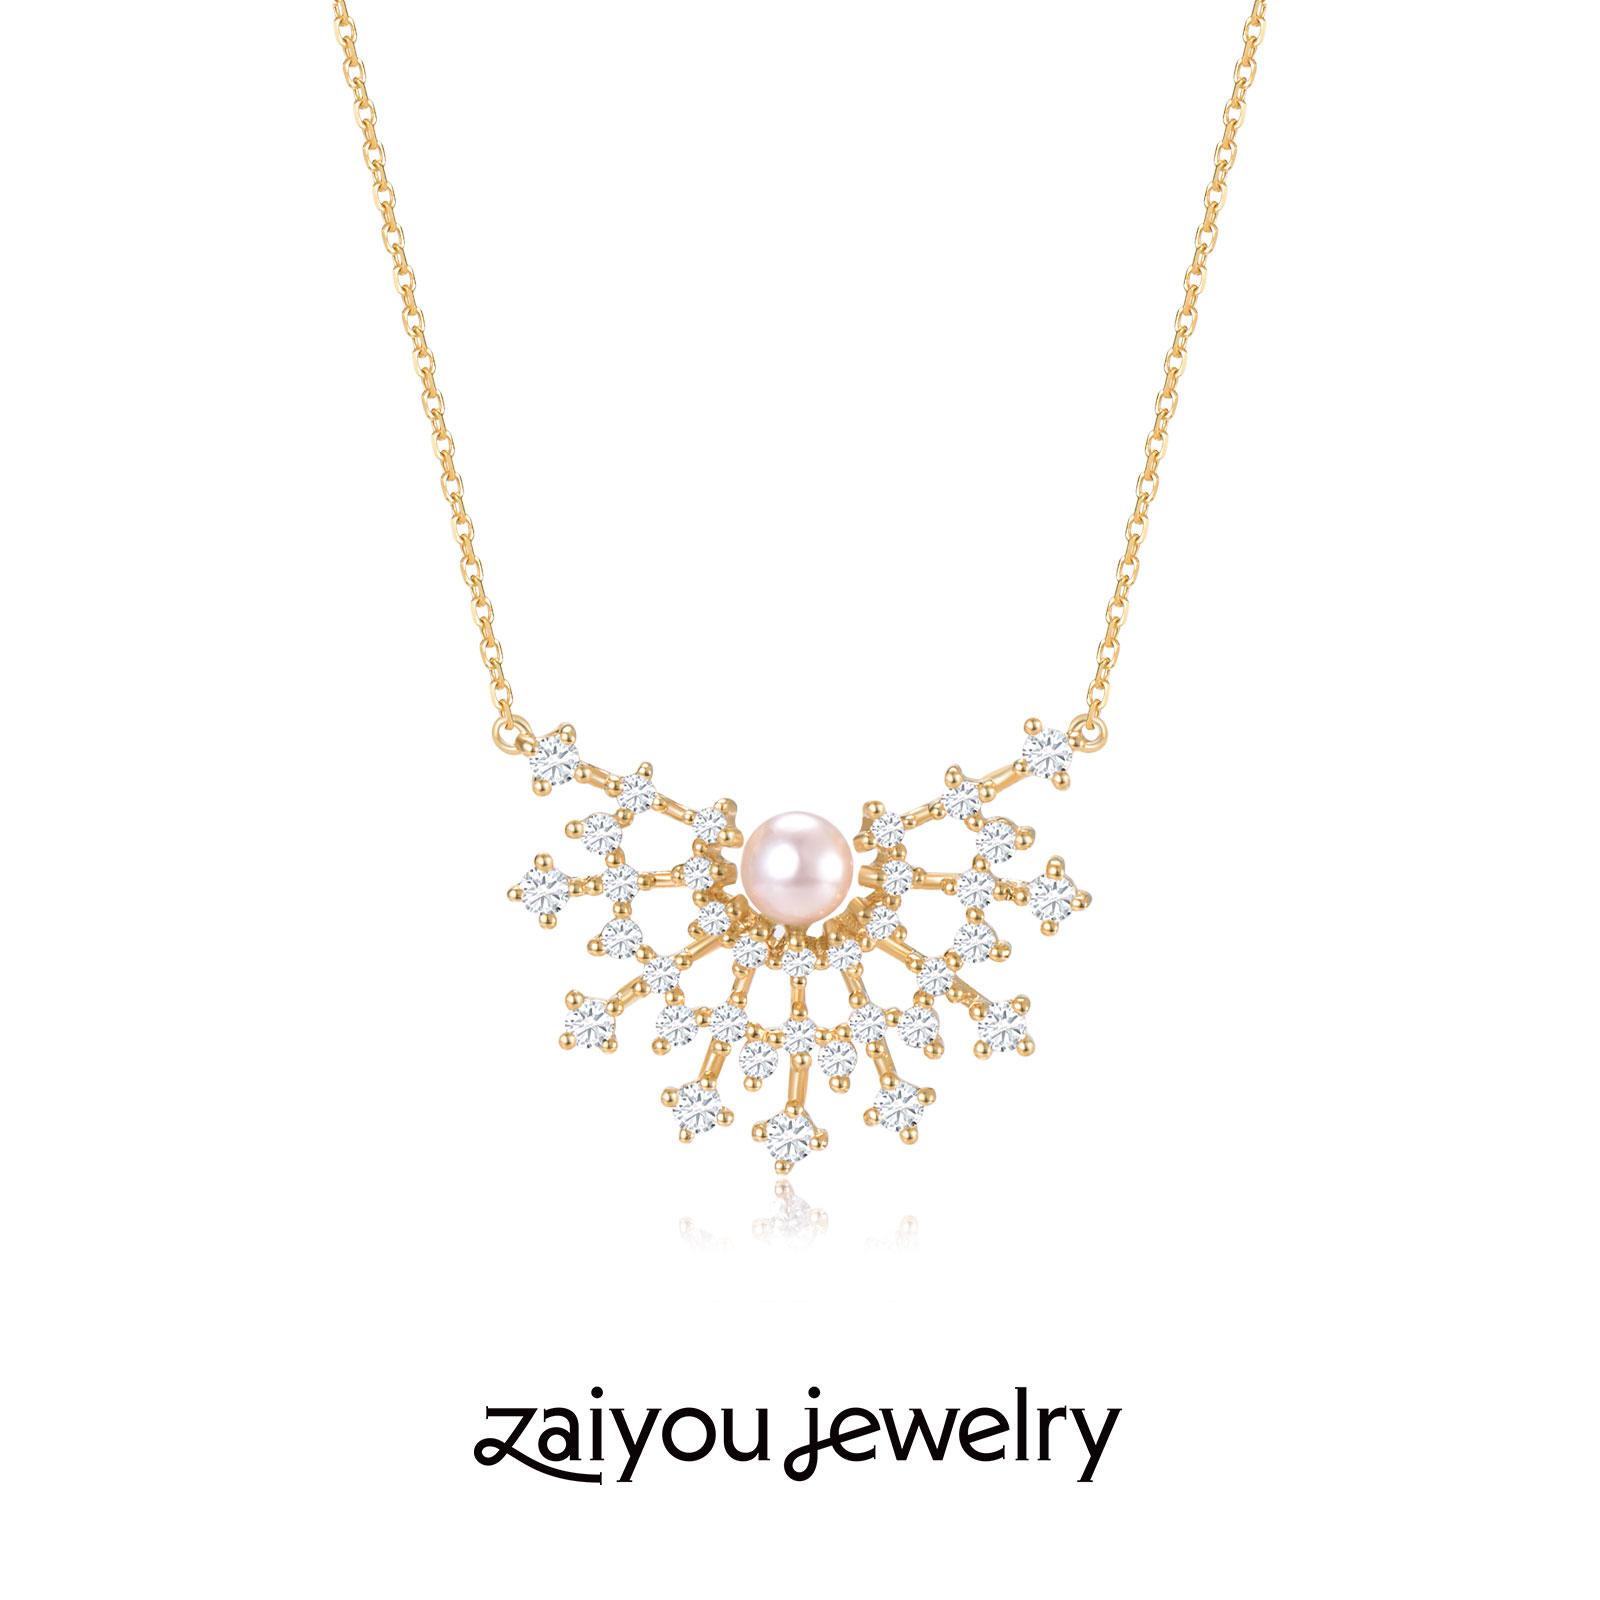 [pearl fan] Qile zaiyou design series K gold Akoya pearl art creative artificial diamond jewelry necklace